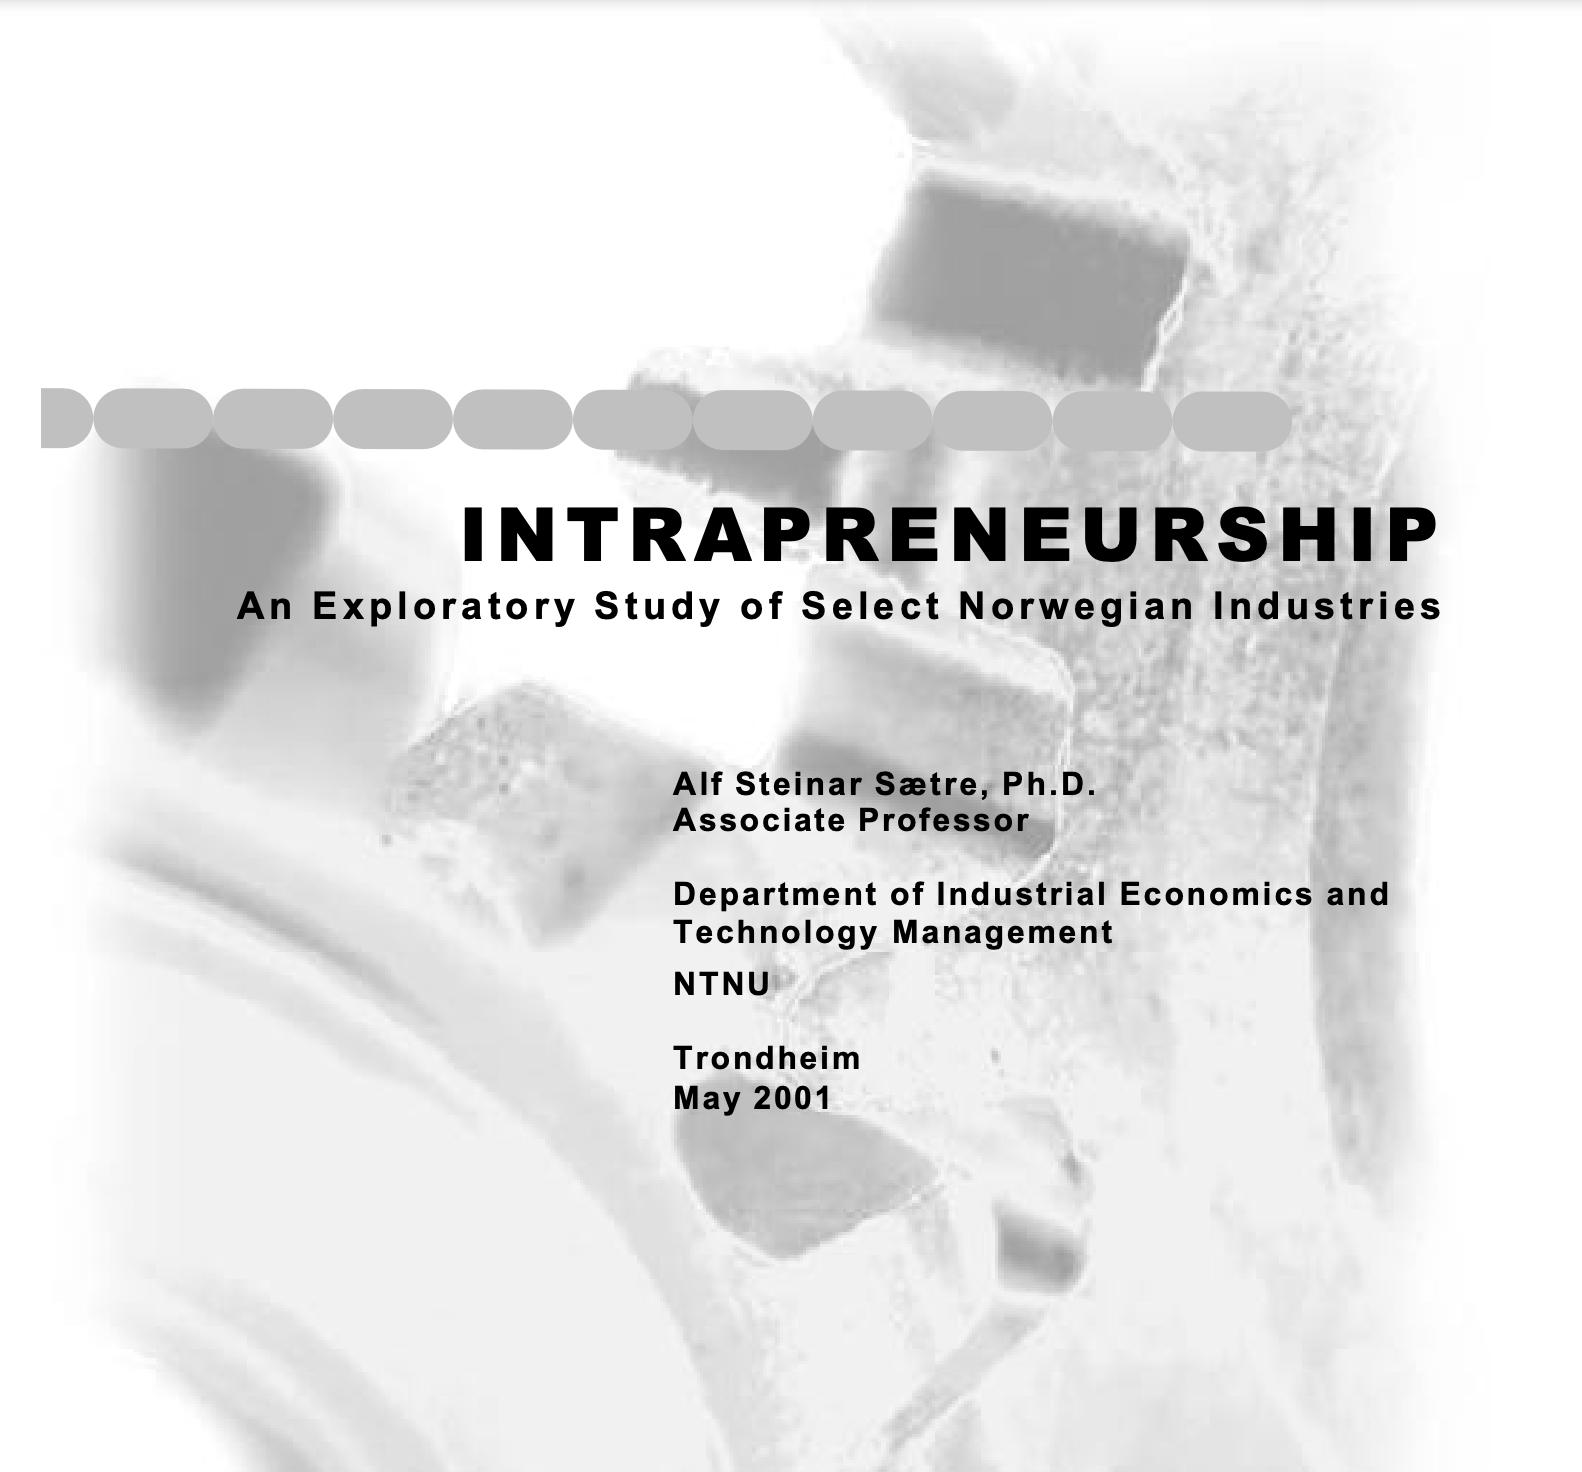 Intrapreneurship: an exploratory study of select Norwegian industries